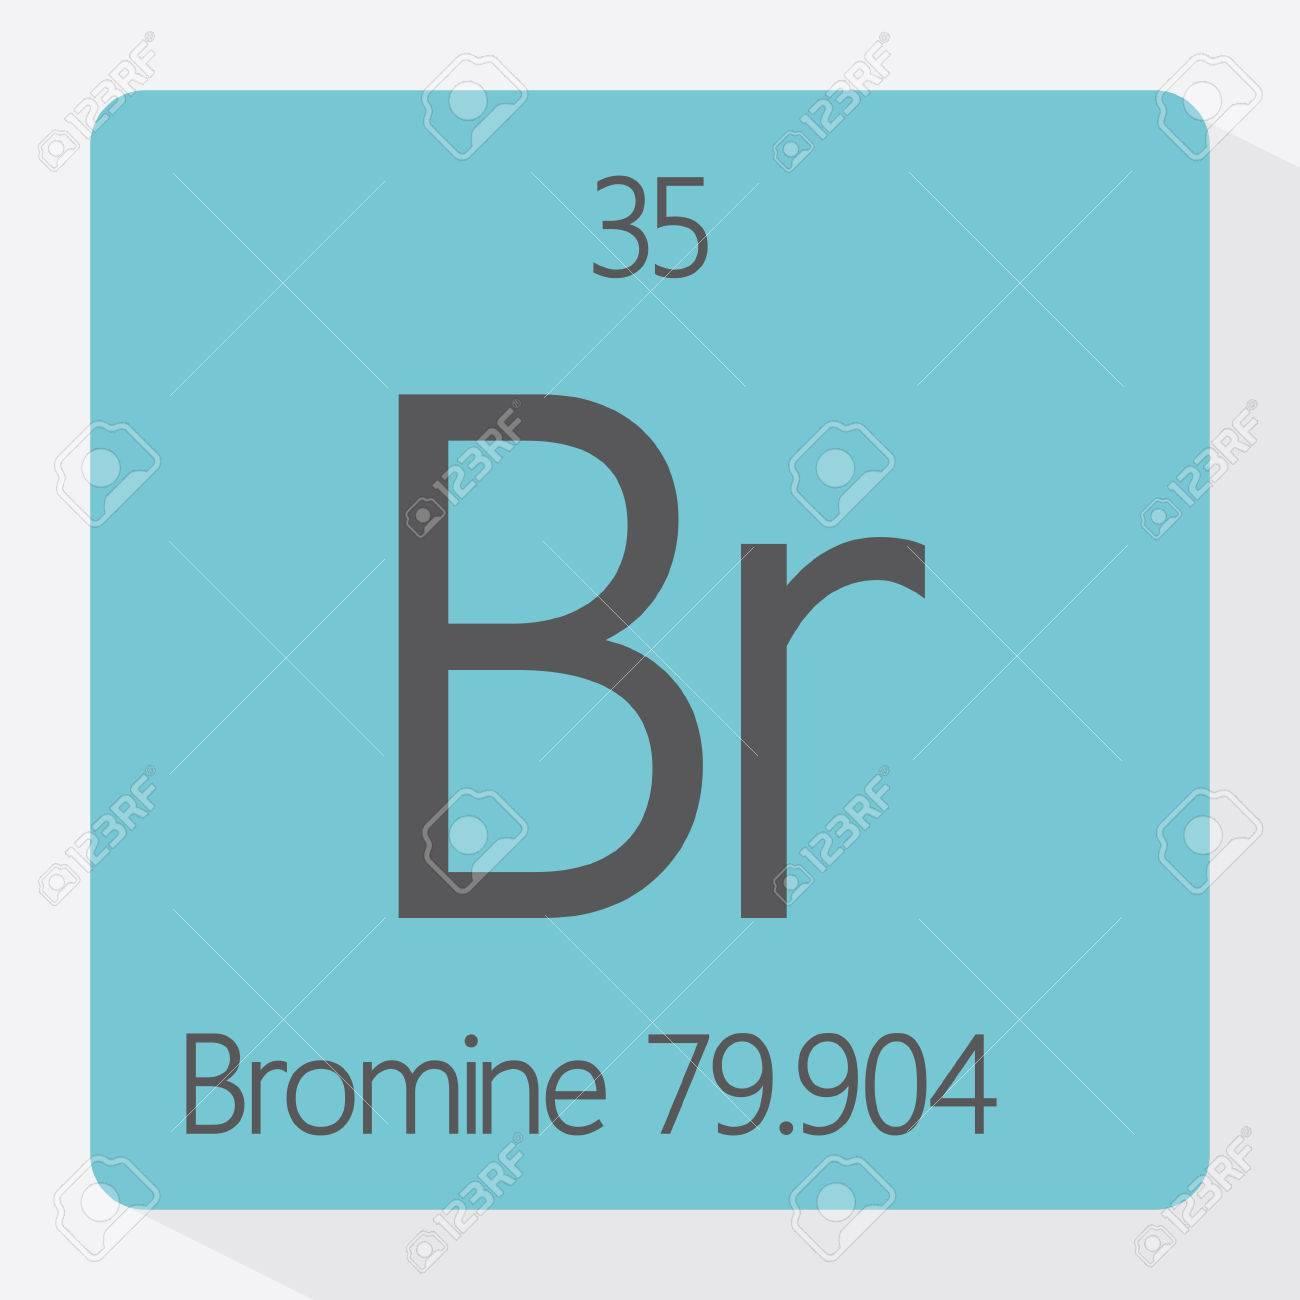 Periodic table bromine royalty free cliparts vectors and stock periodic table bromine stock vector 41431642 buycottarizona Choice Image